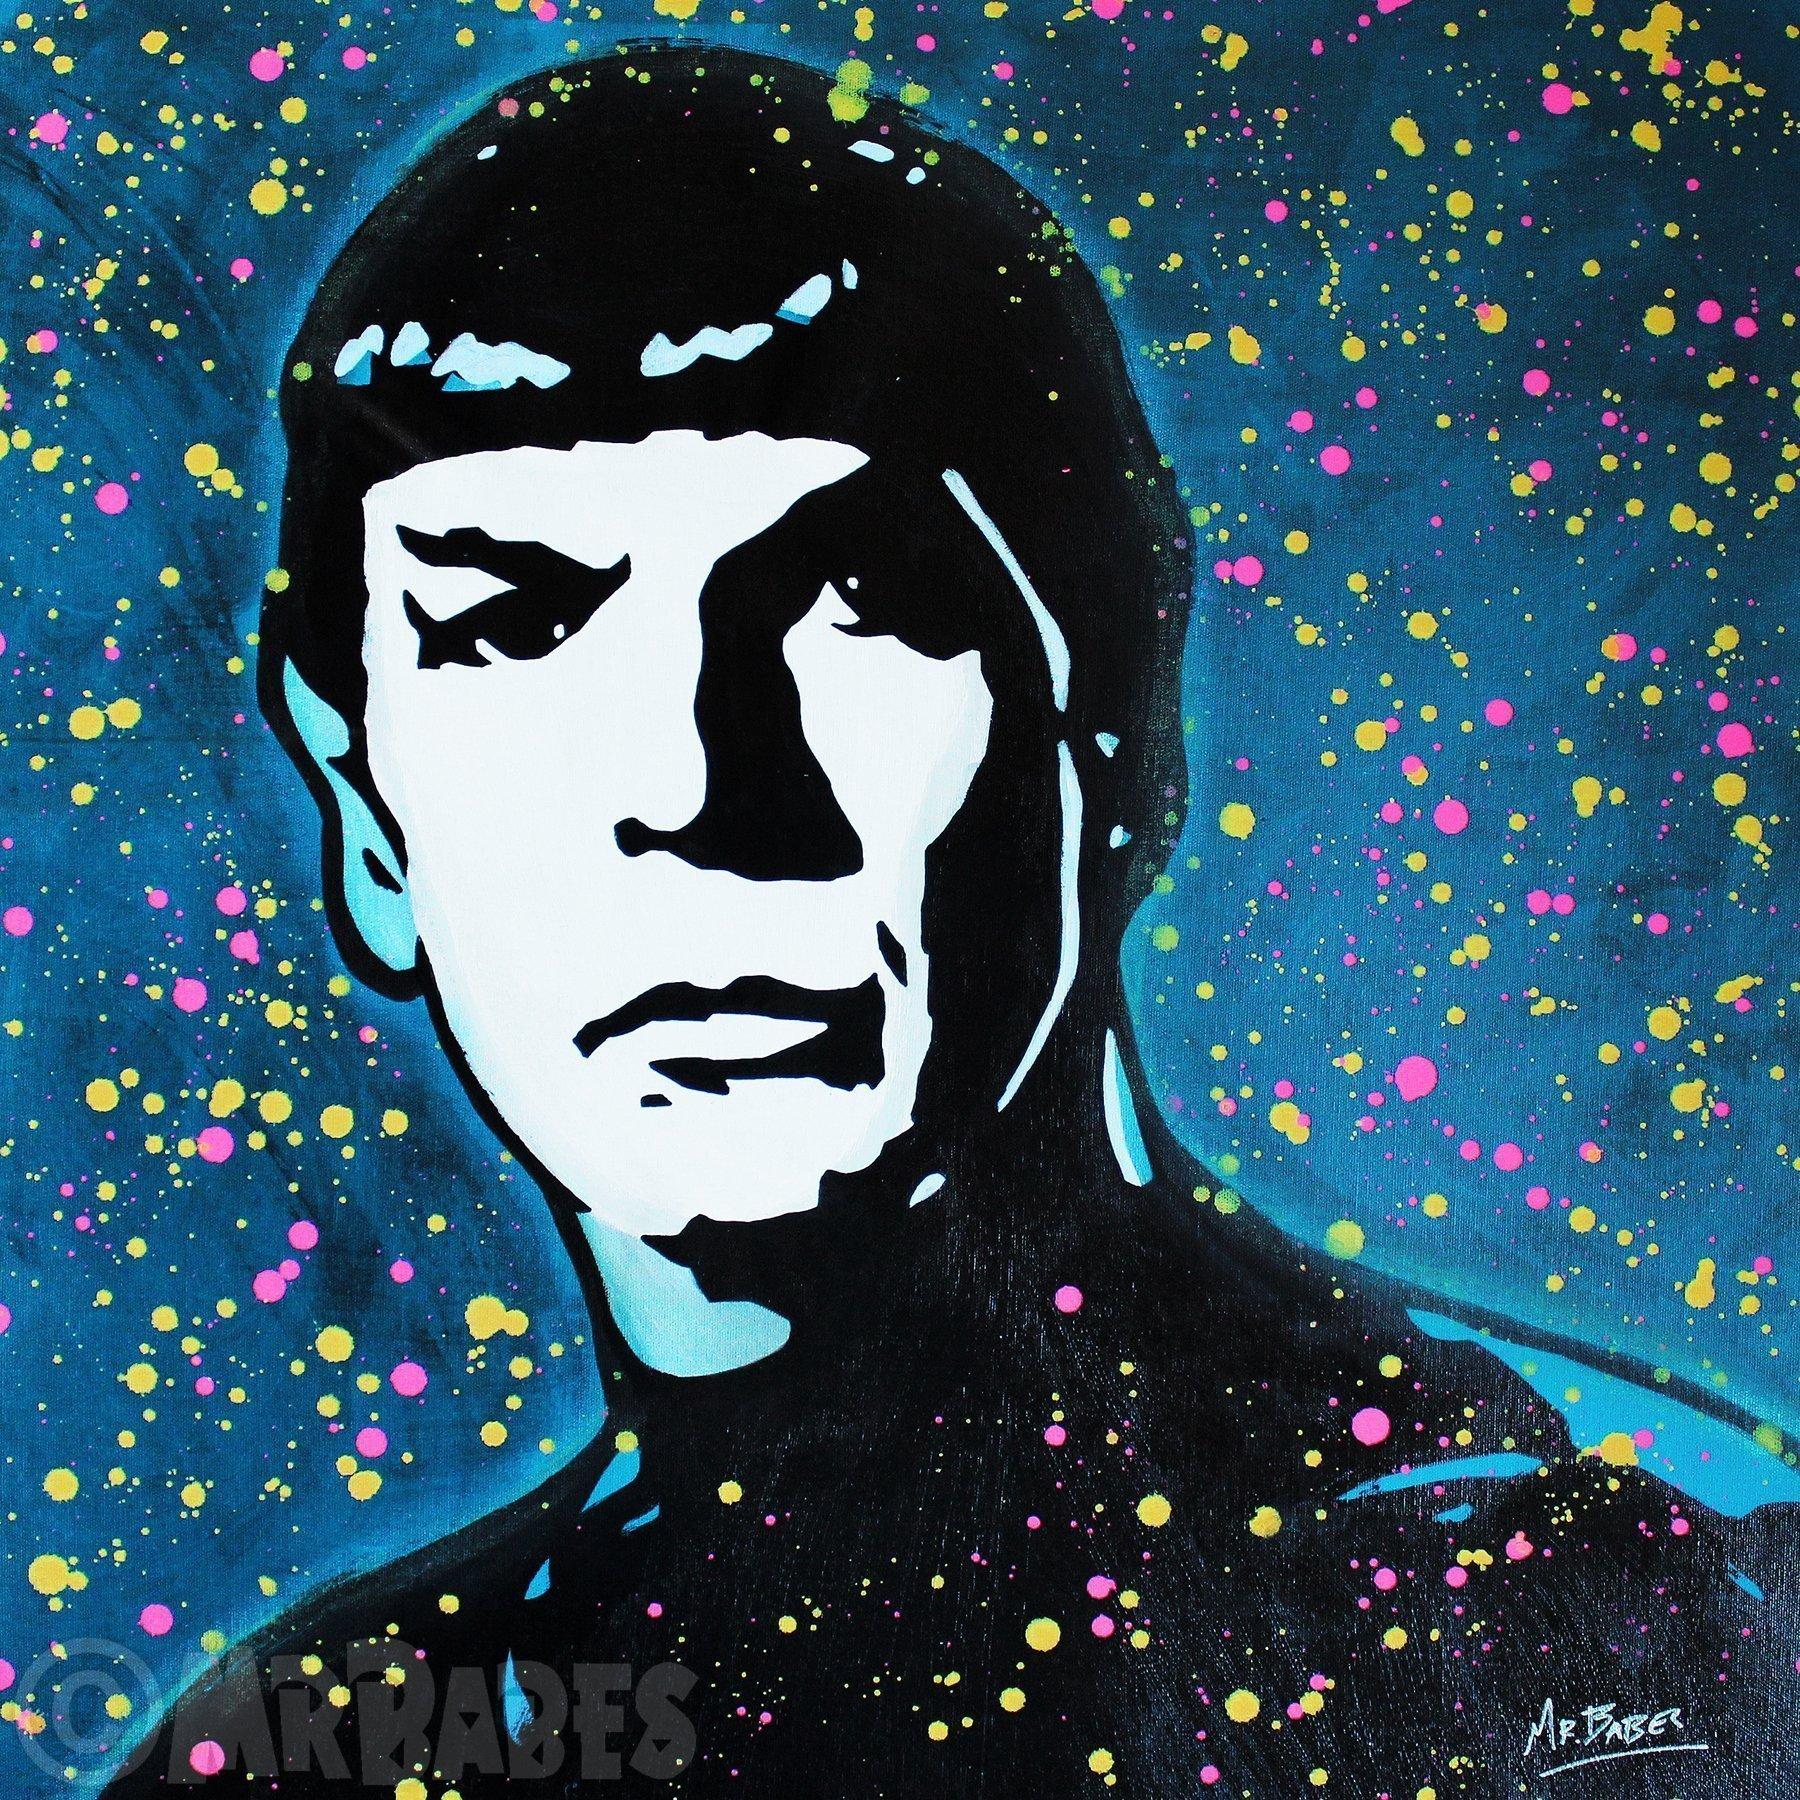 MR.BABES - ''Star Trek: Spock (Leonard Nimoy)'' - Original Pop Art Painting - TV Show Movie Portrait